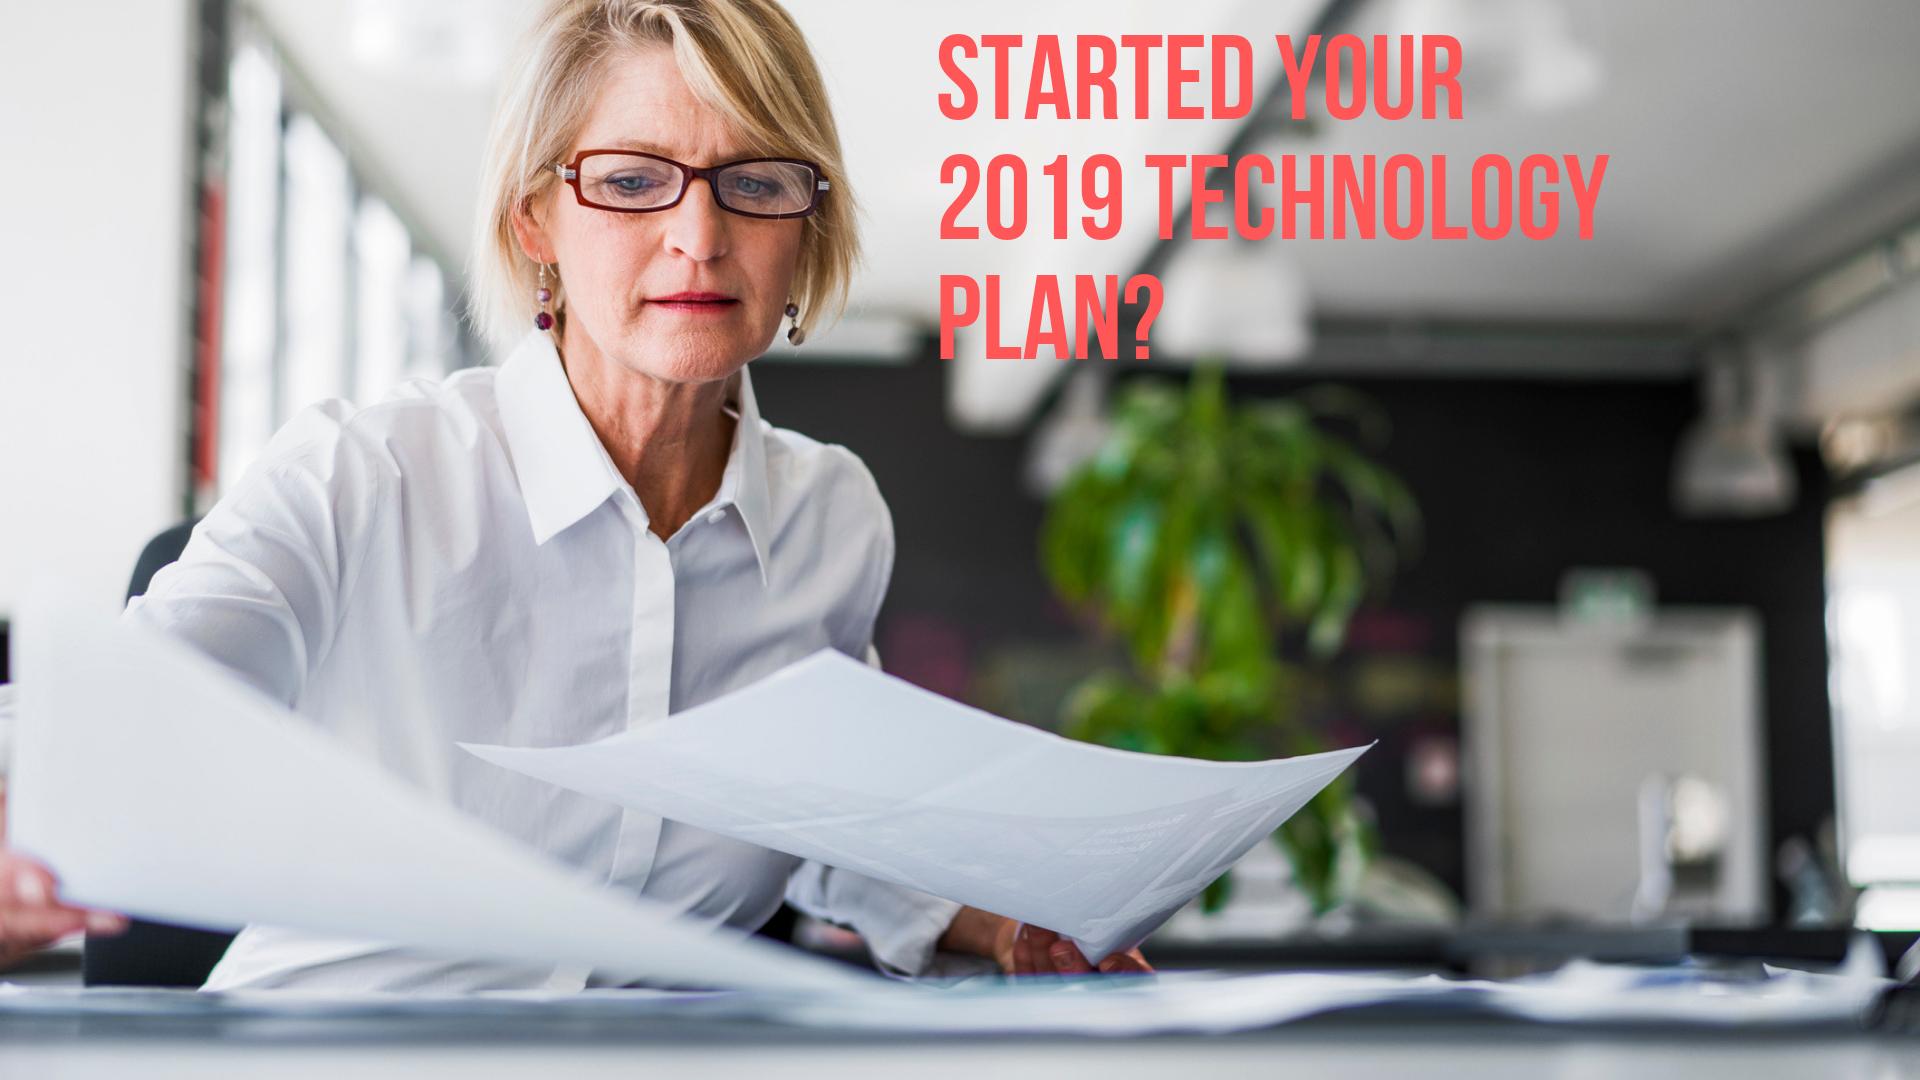 2019 Technology Plan